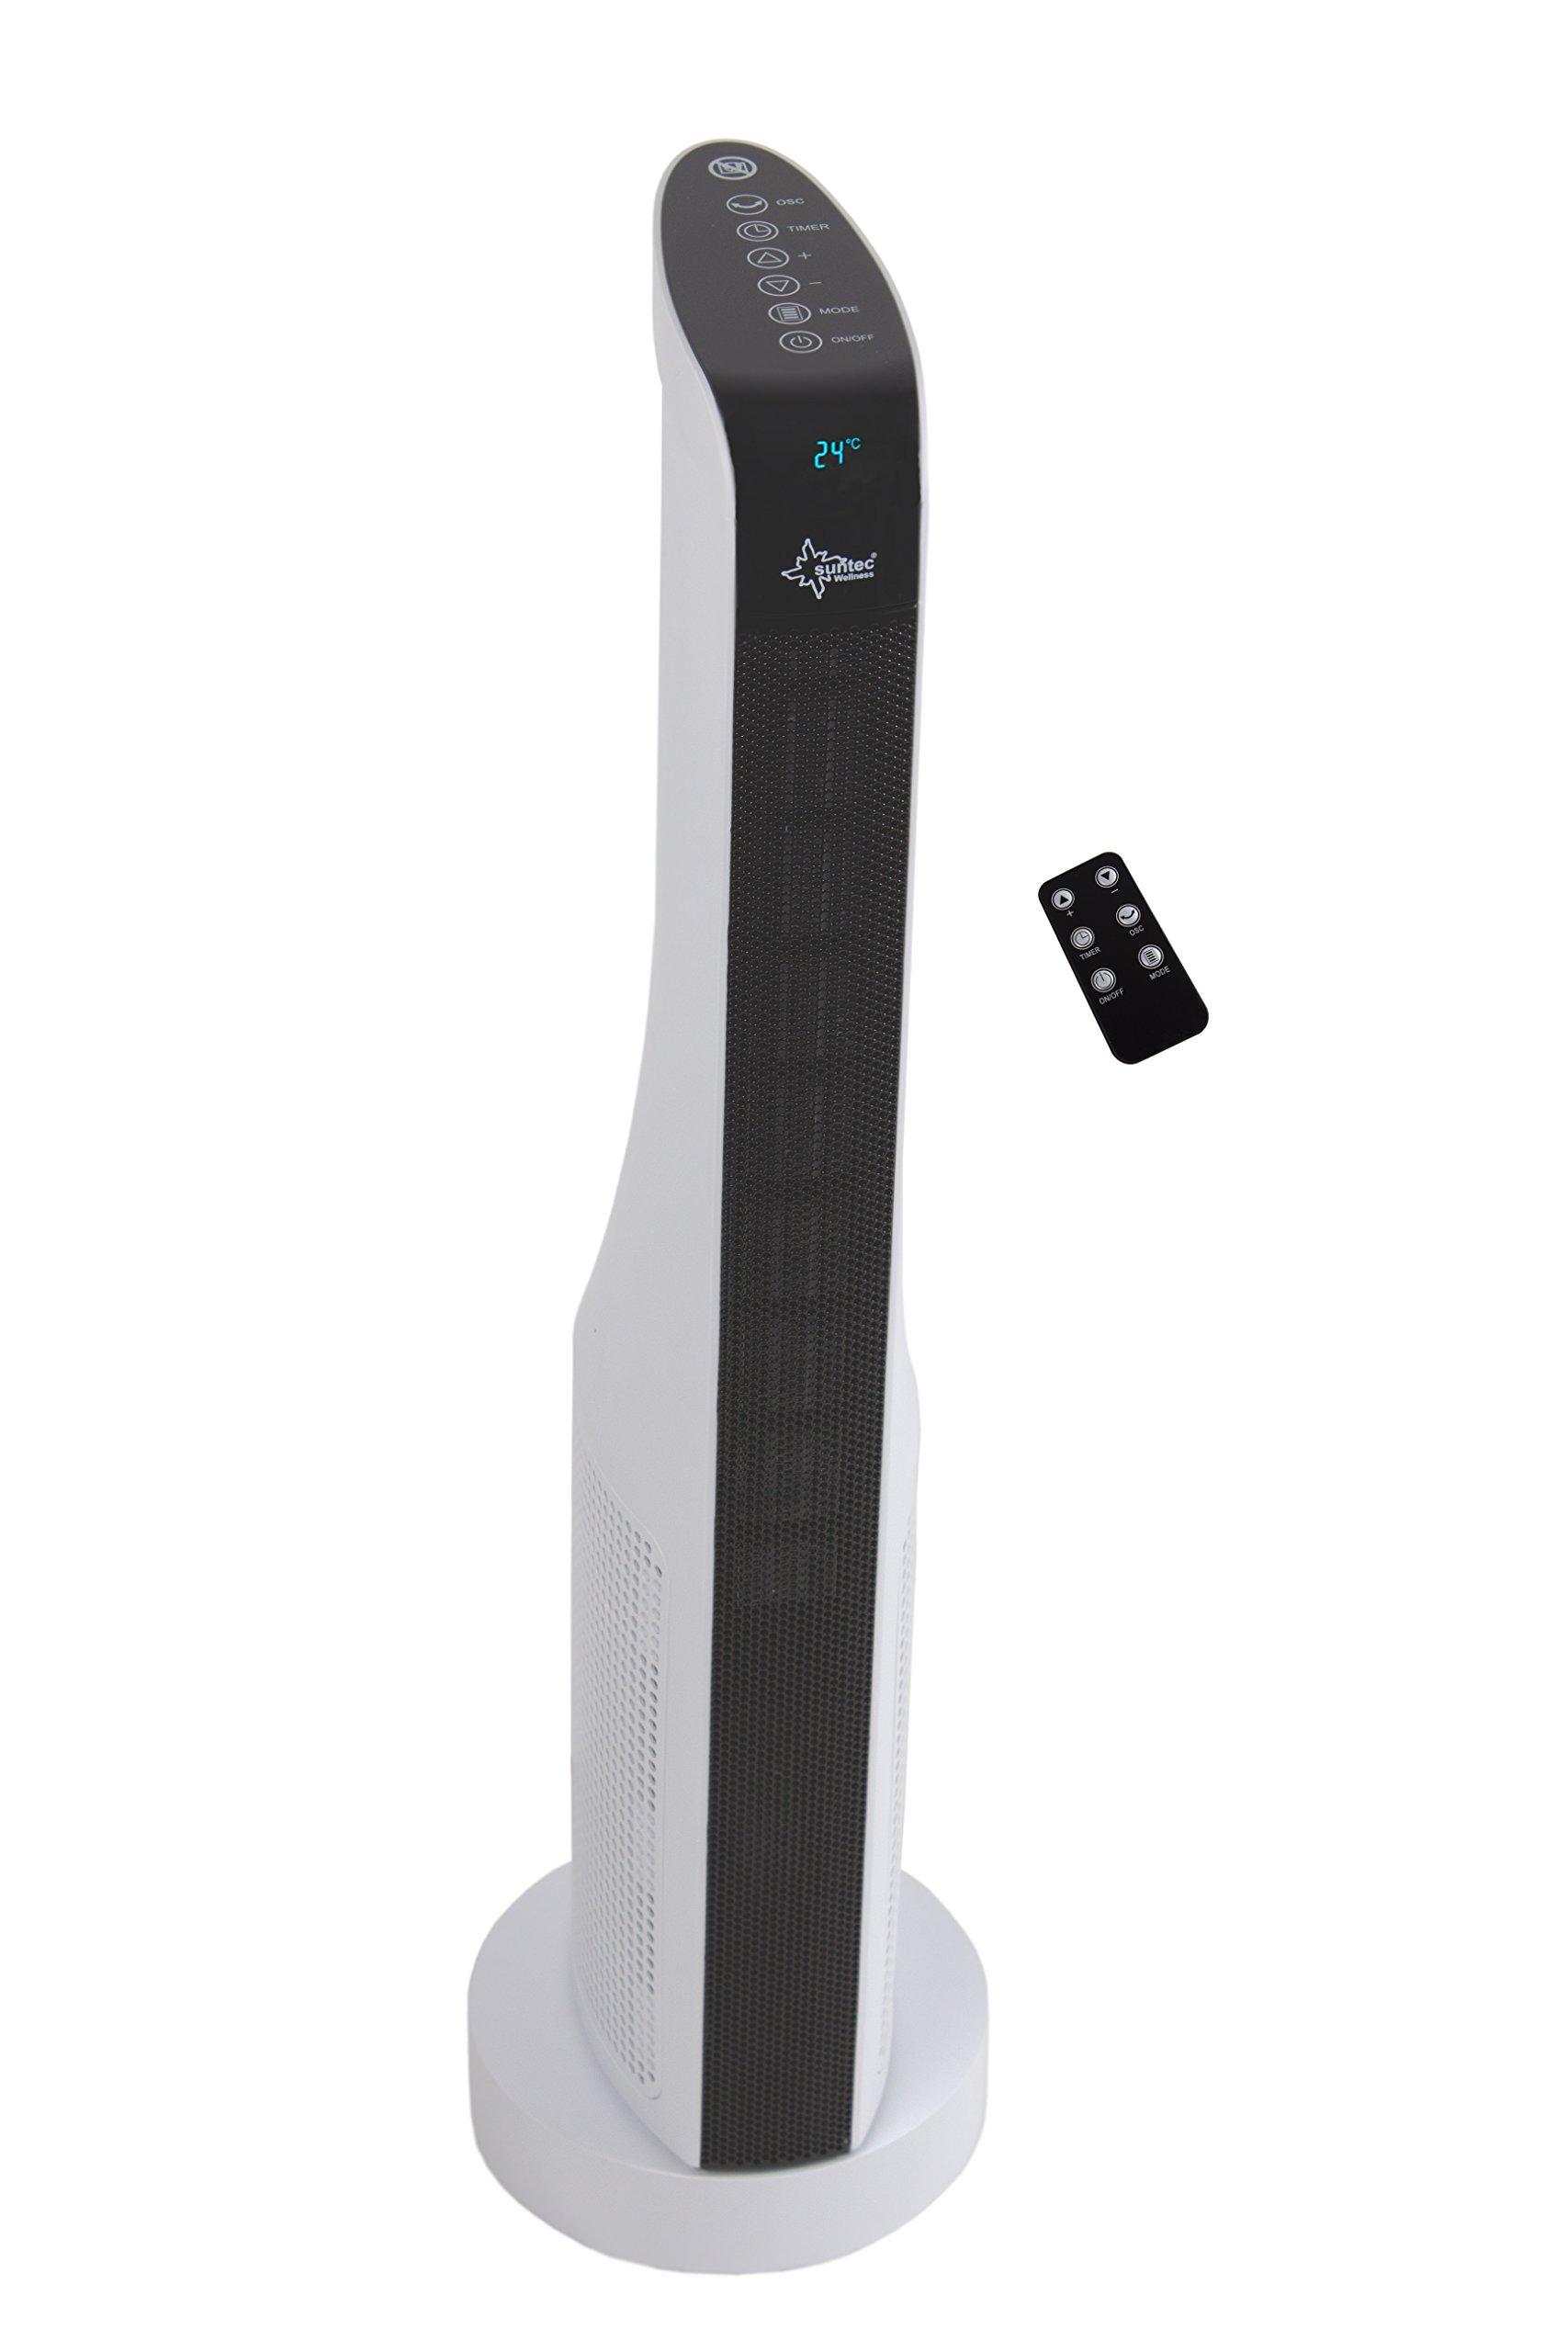 Termoventilatore Suntec Heat Prime PTC 2000 W, 70 cm, bianco [13058]